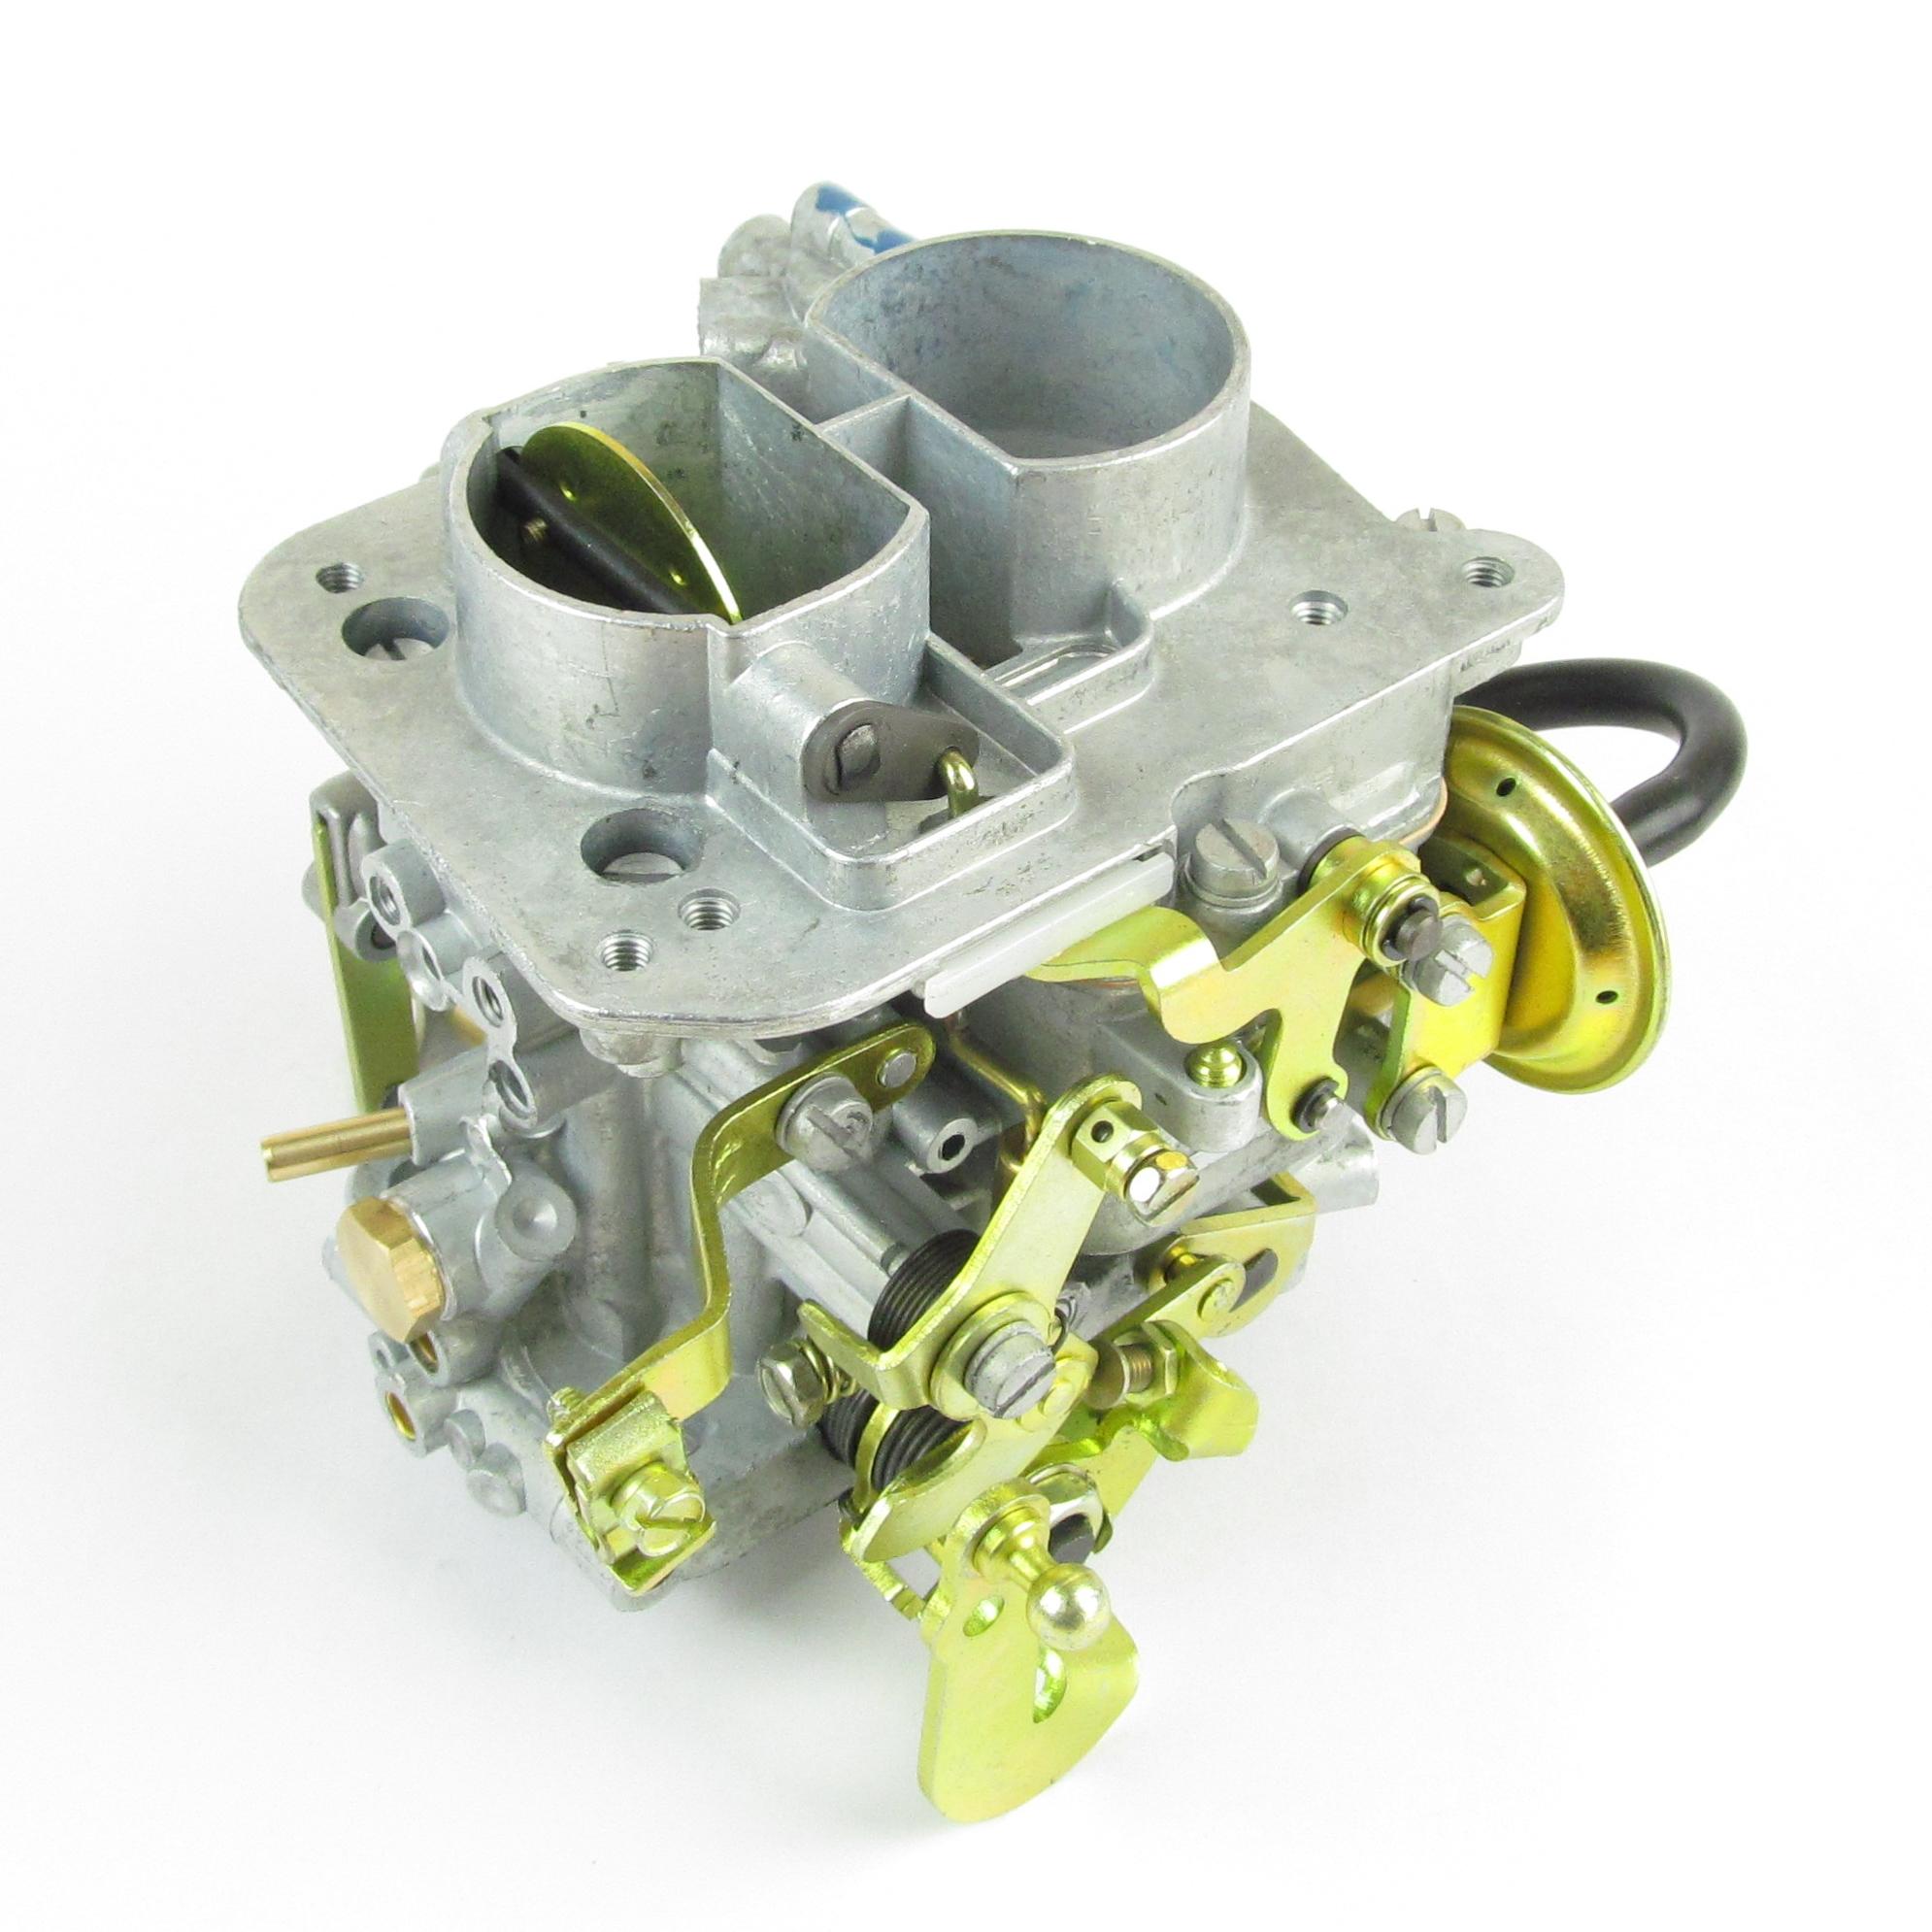 22670.004 WEBER DMTL 32/34 Carburettor - Spedeworth Stock ...